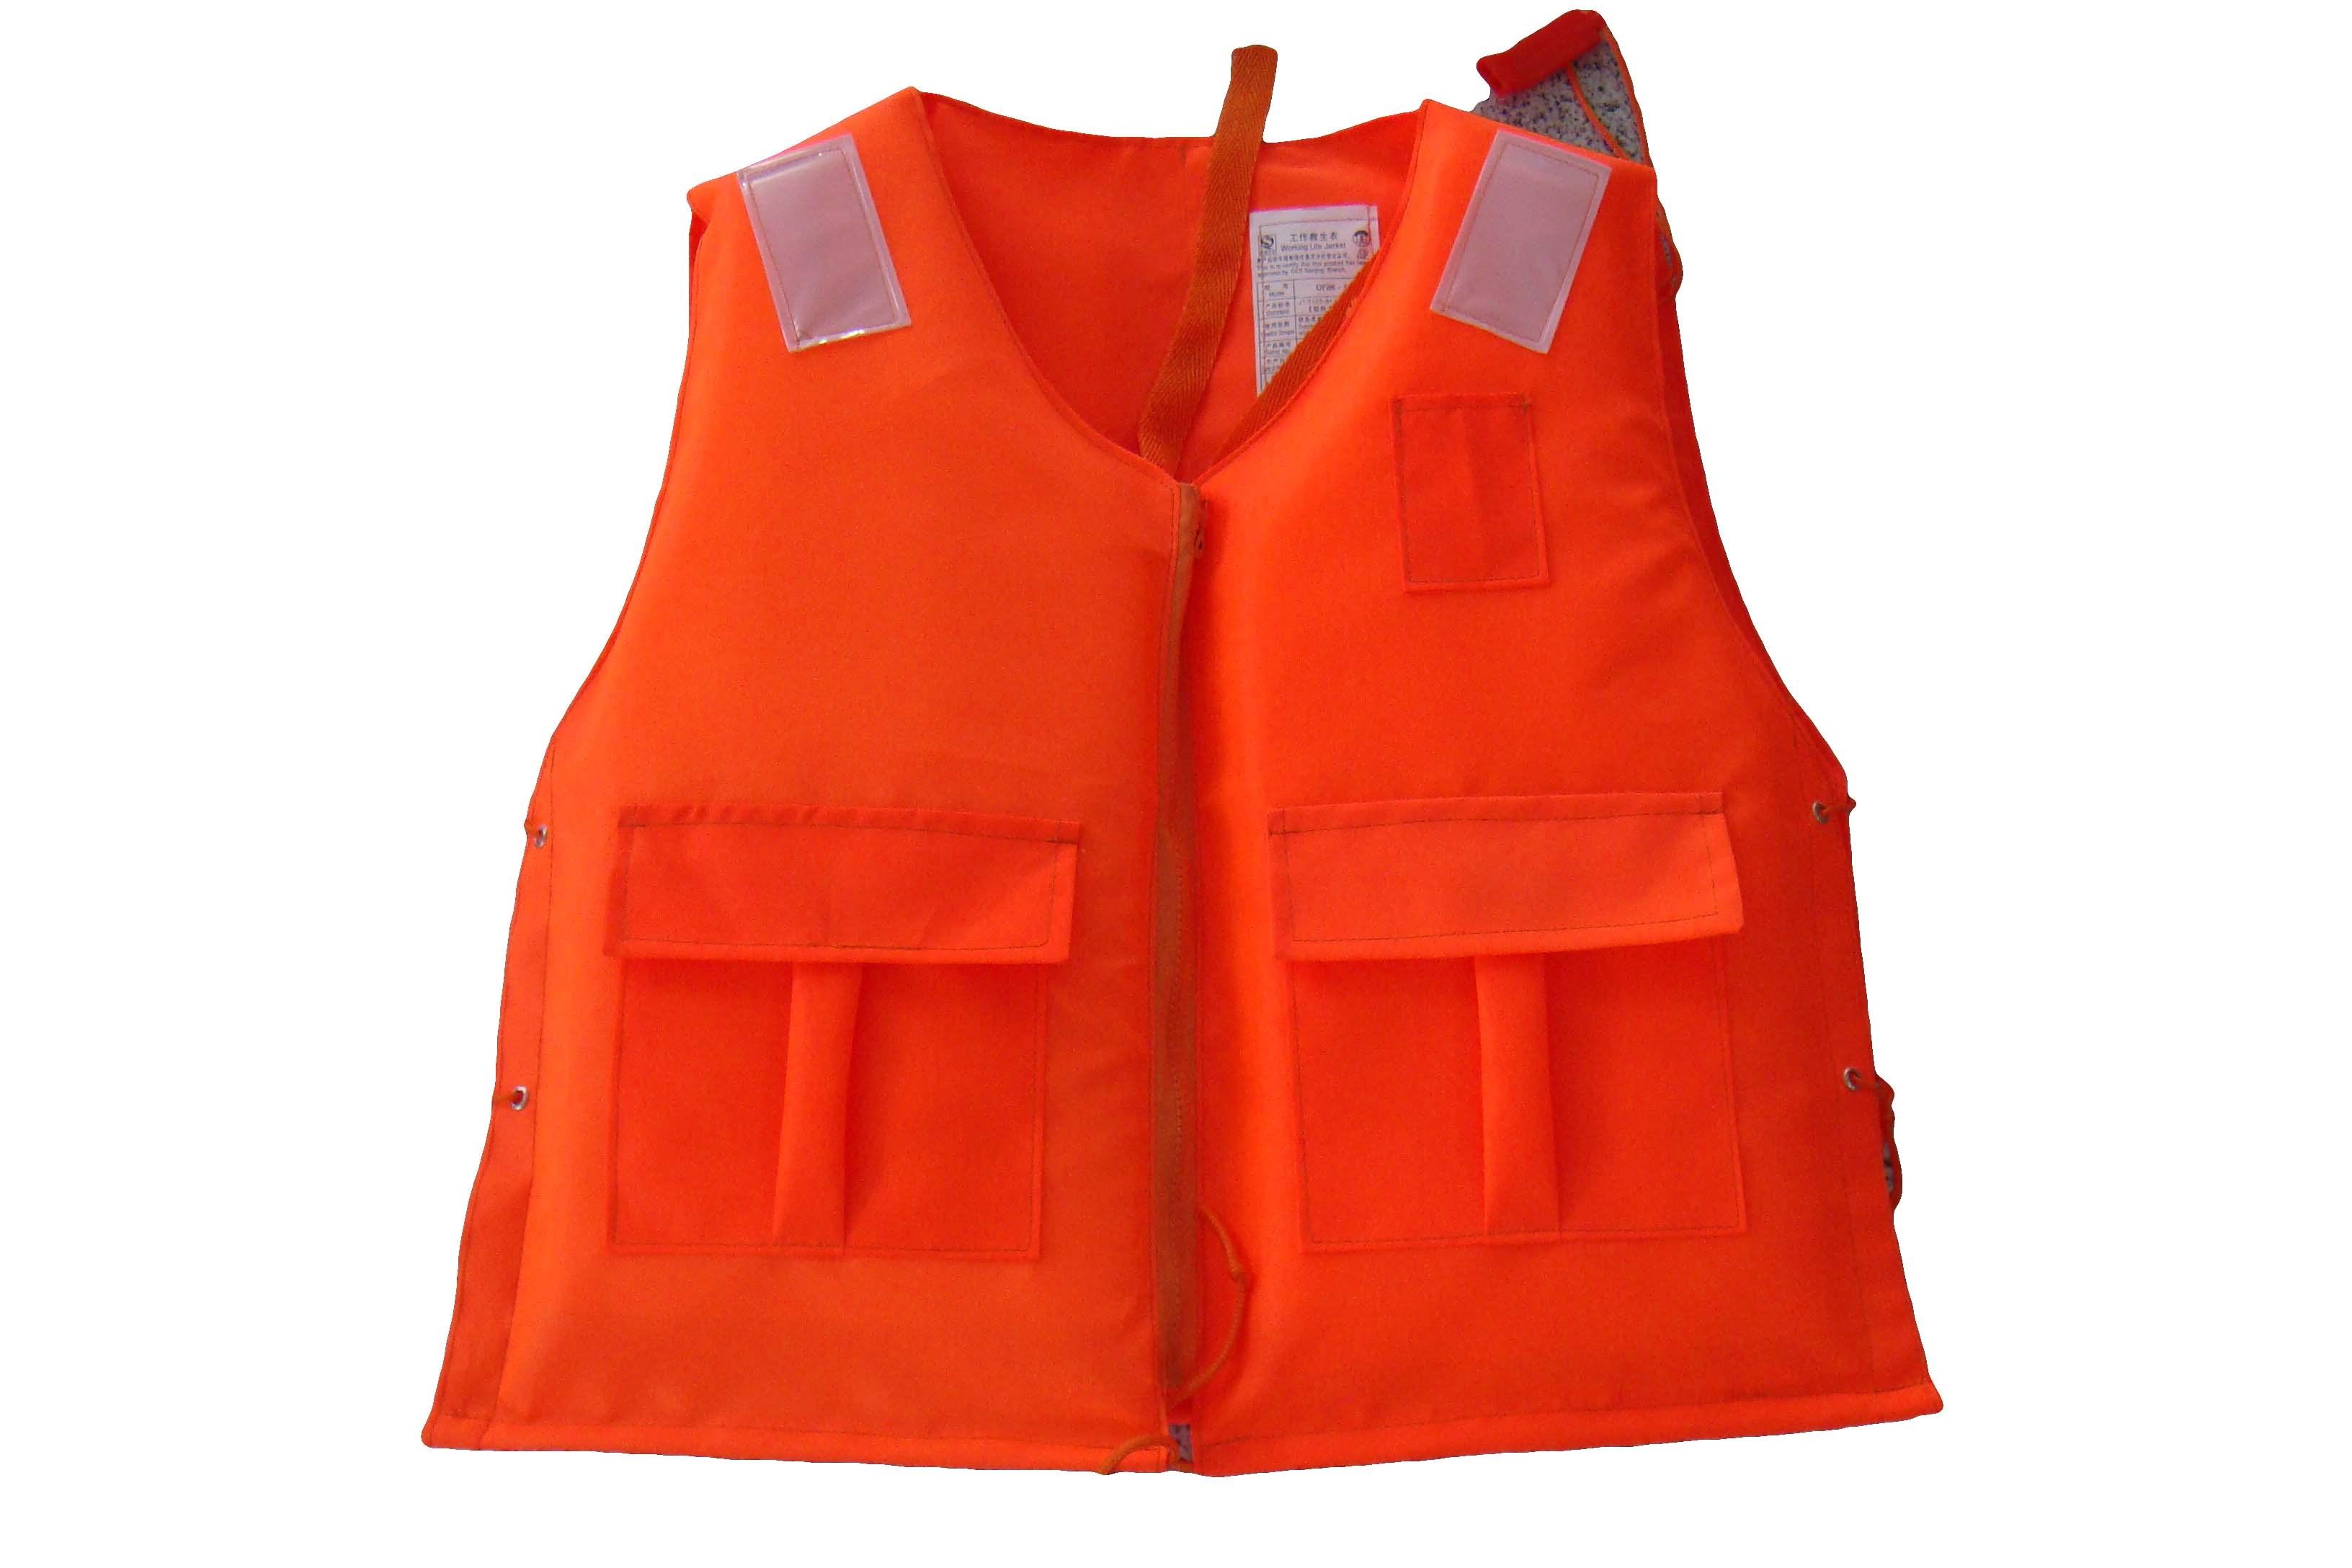 Solas Approved Marine Life Jacket